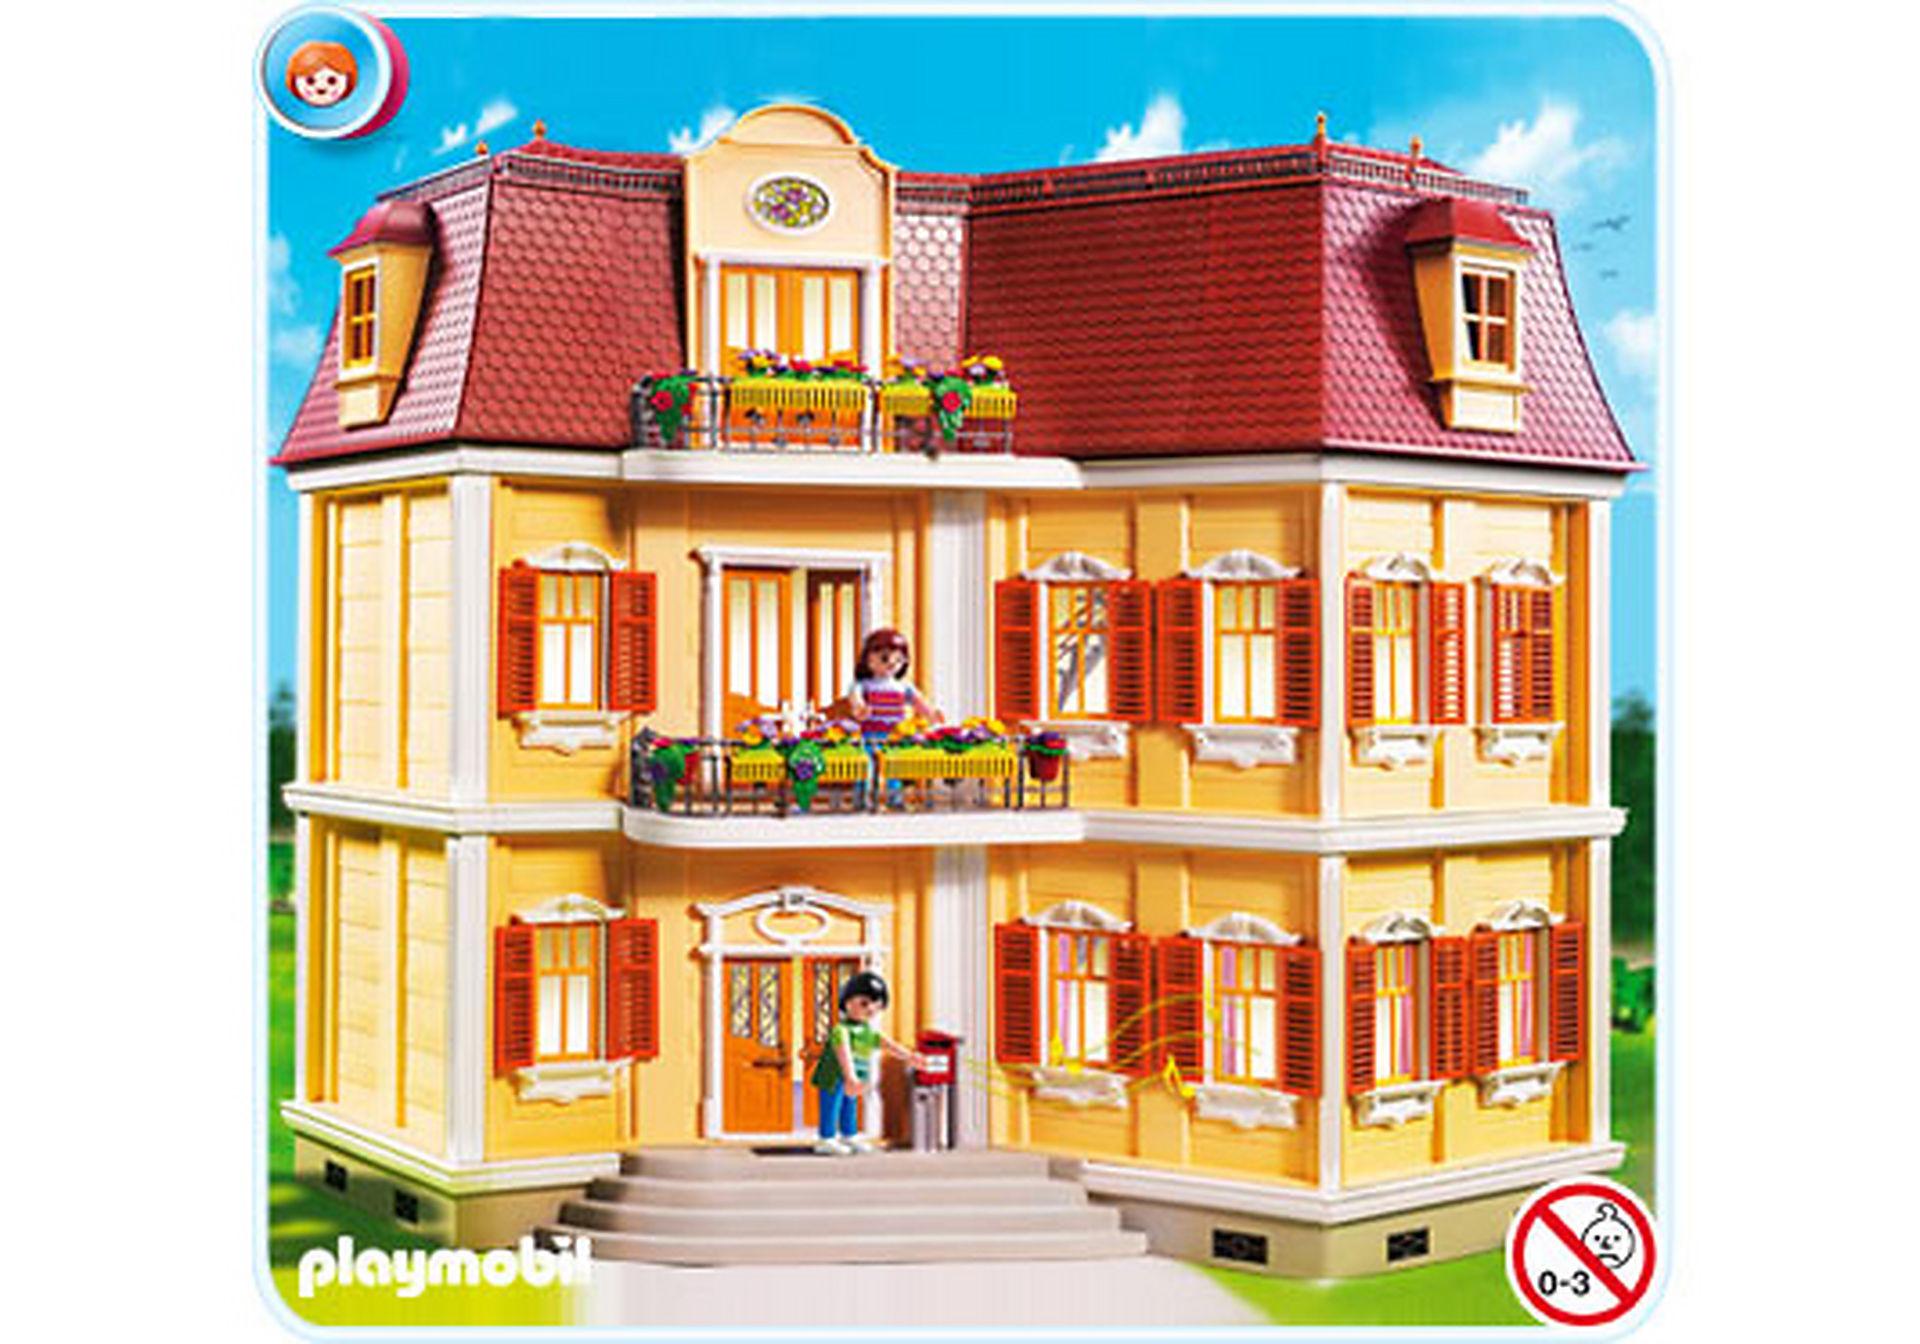 5302-A Mein Großes Puppenhaus zoom image1